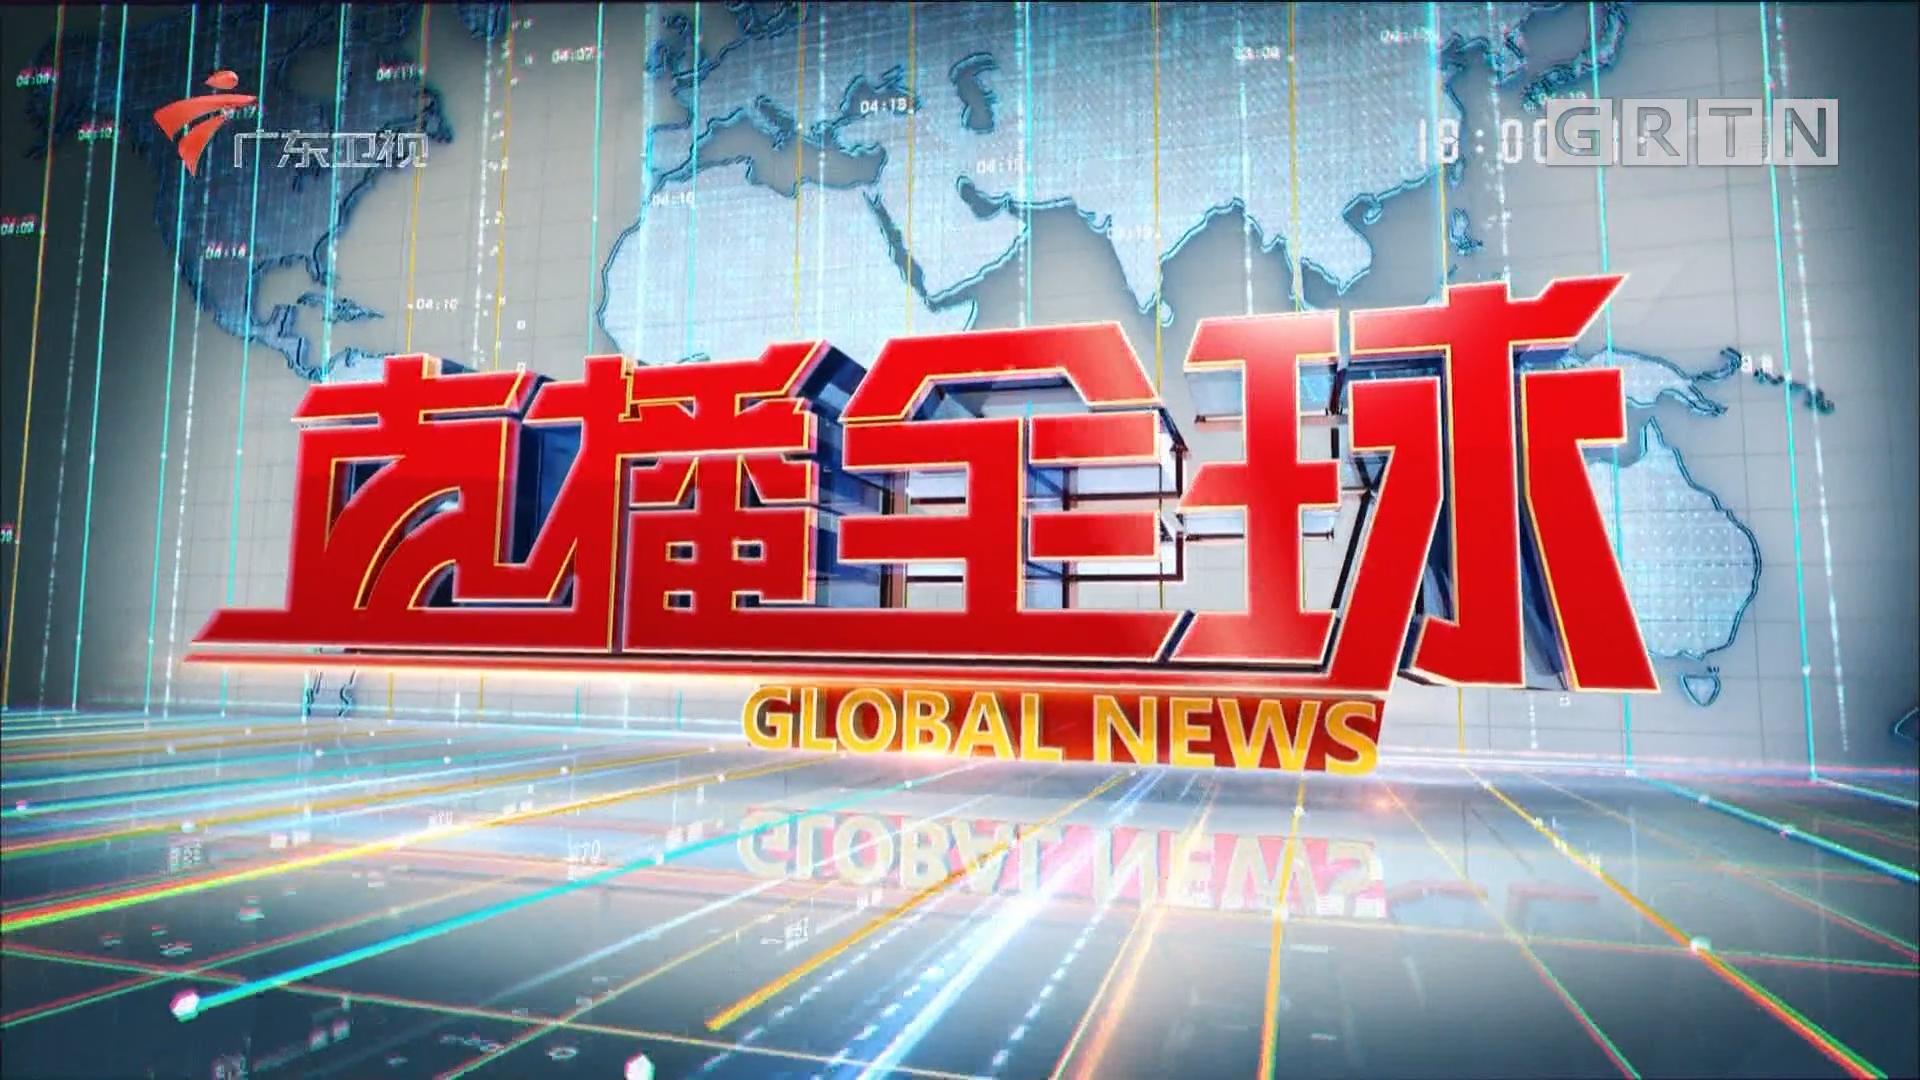 [HD][2019-04-08]直播全球:大湾区日志:河套地区探索新机制 深港科技合作再提速